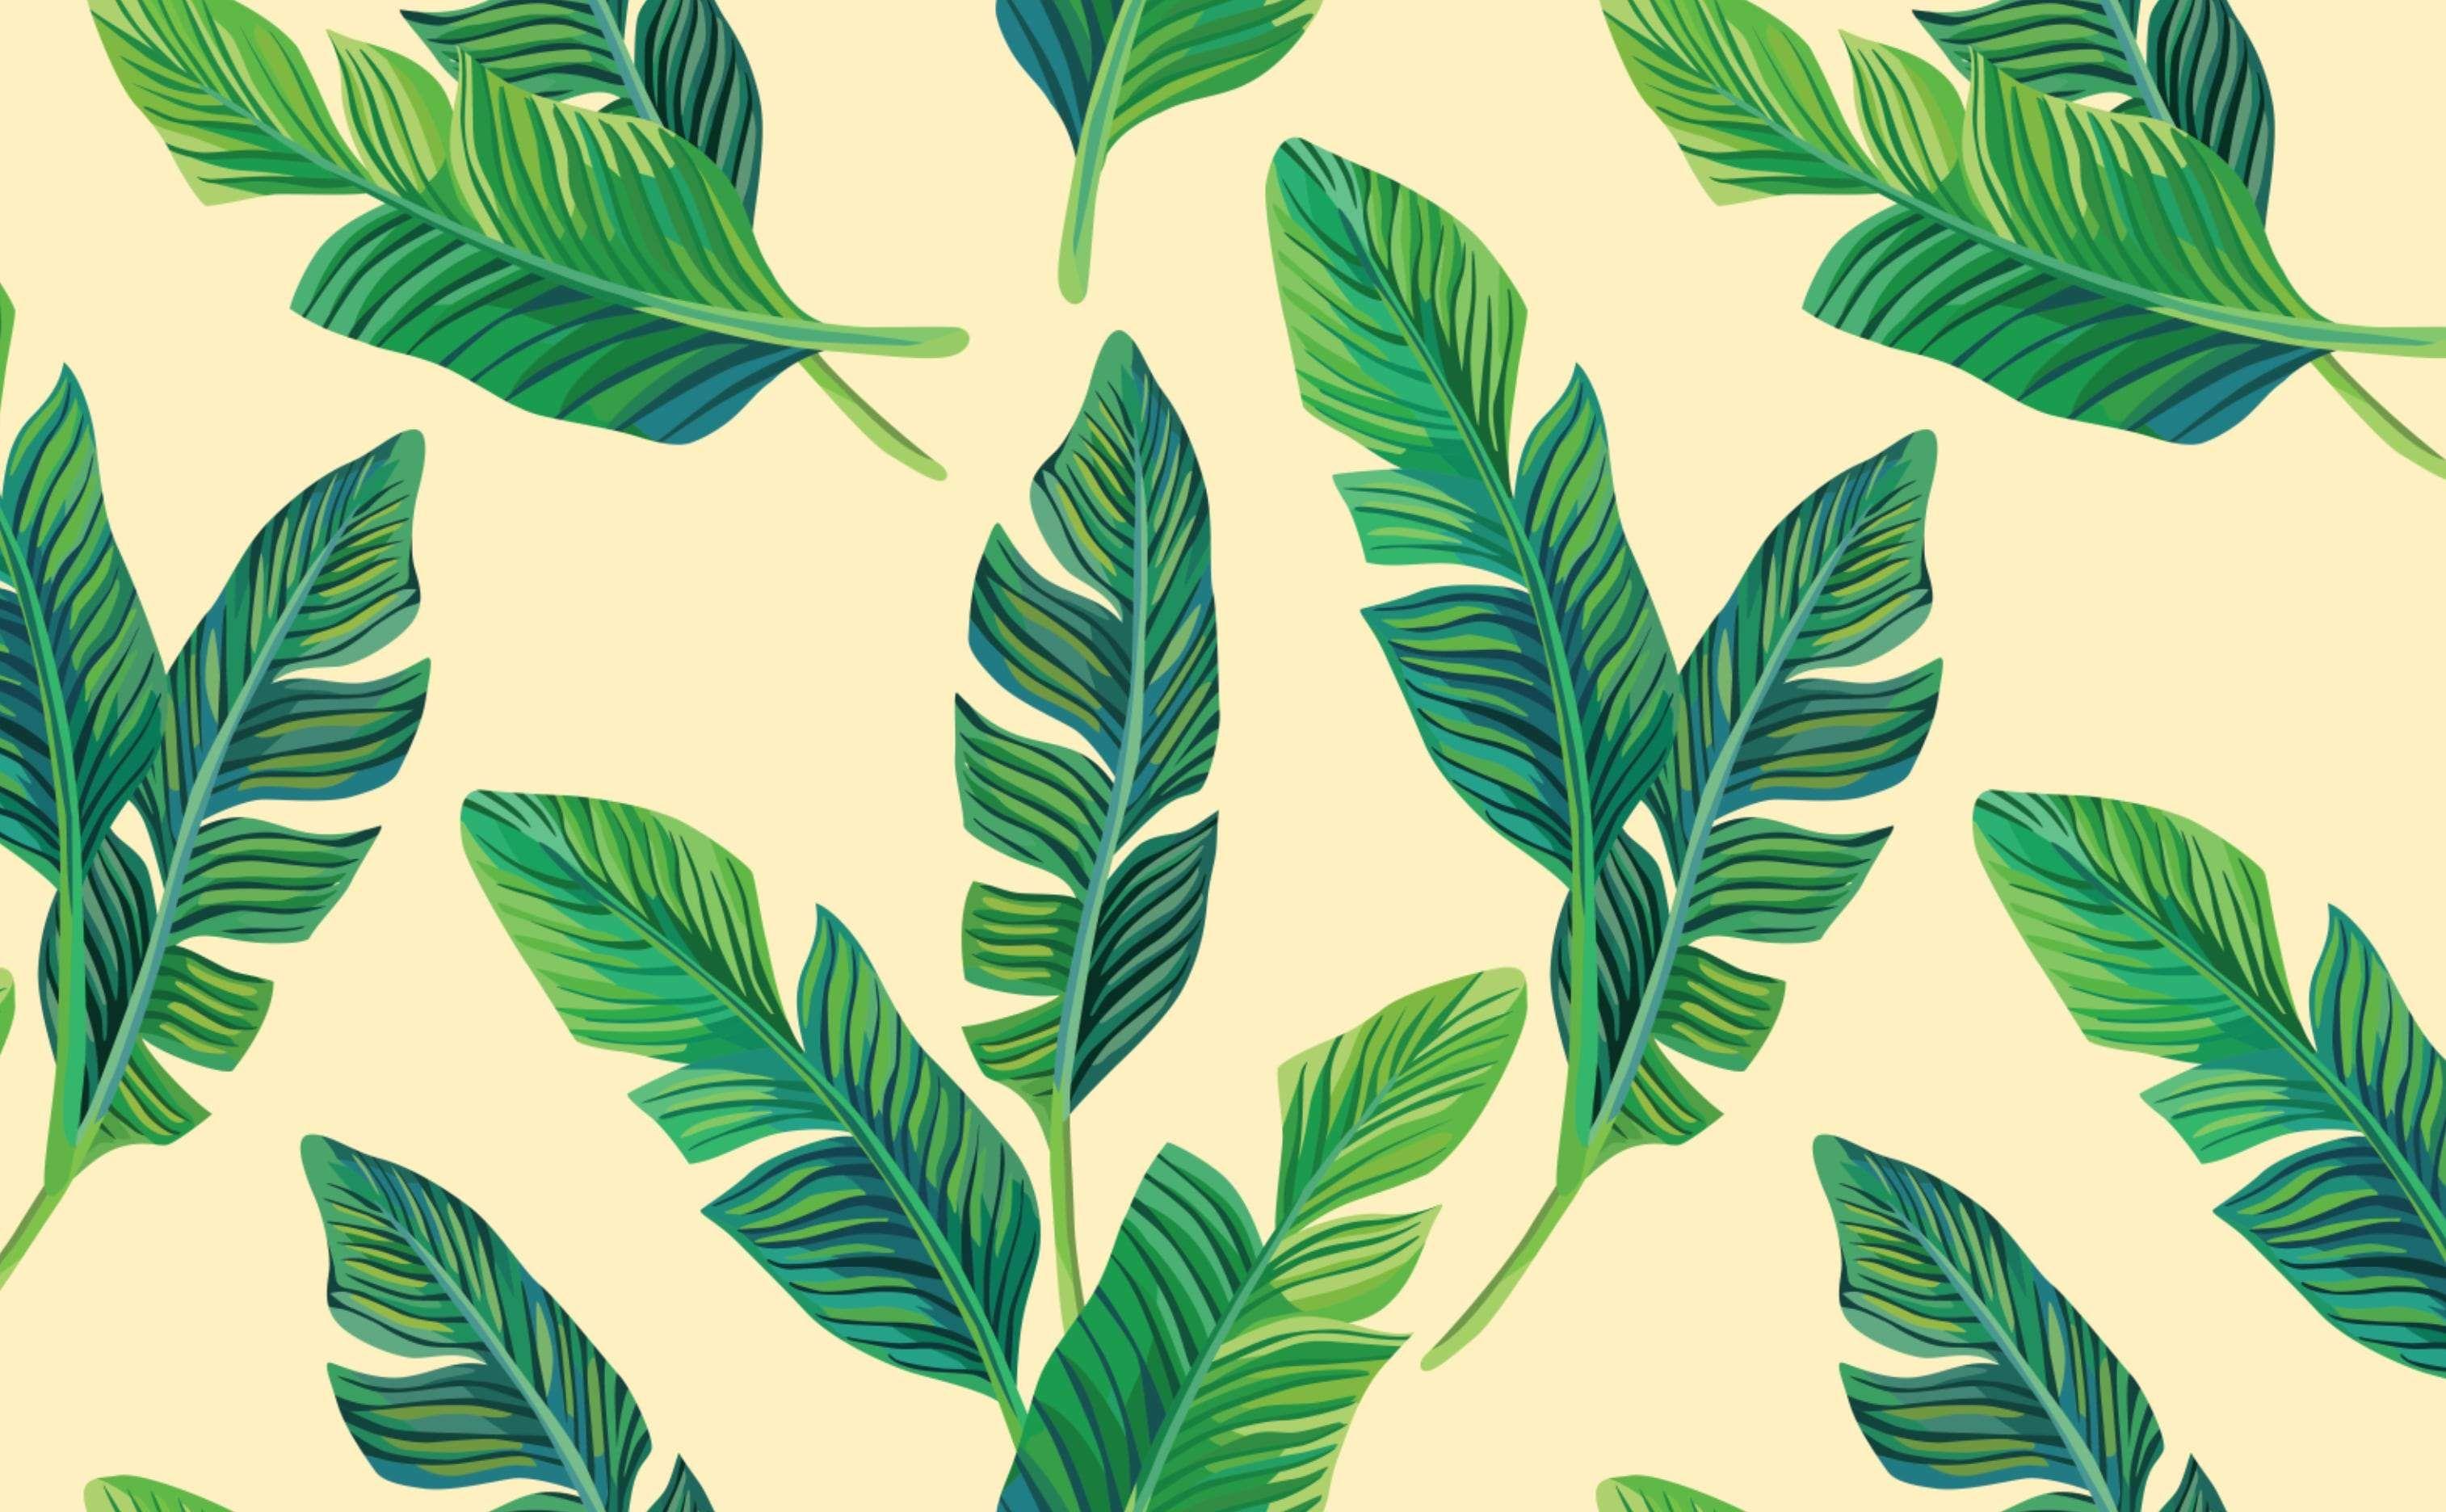 Falling Palms In 2021 Palm Leaf Wallpaper Leaf Wallpaper Palm Wallpaper